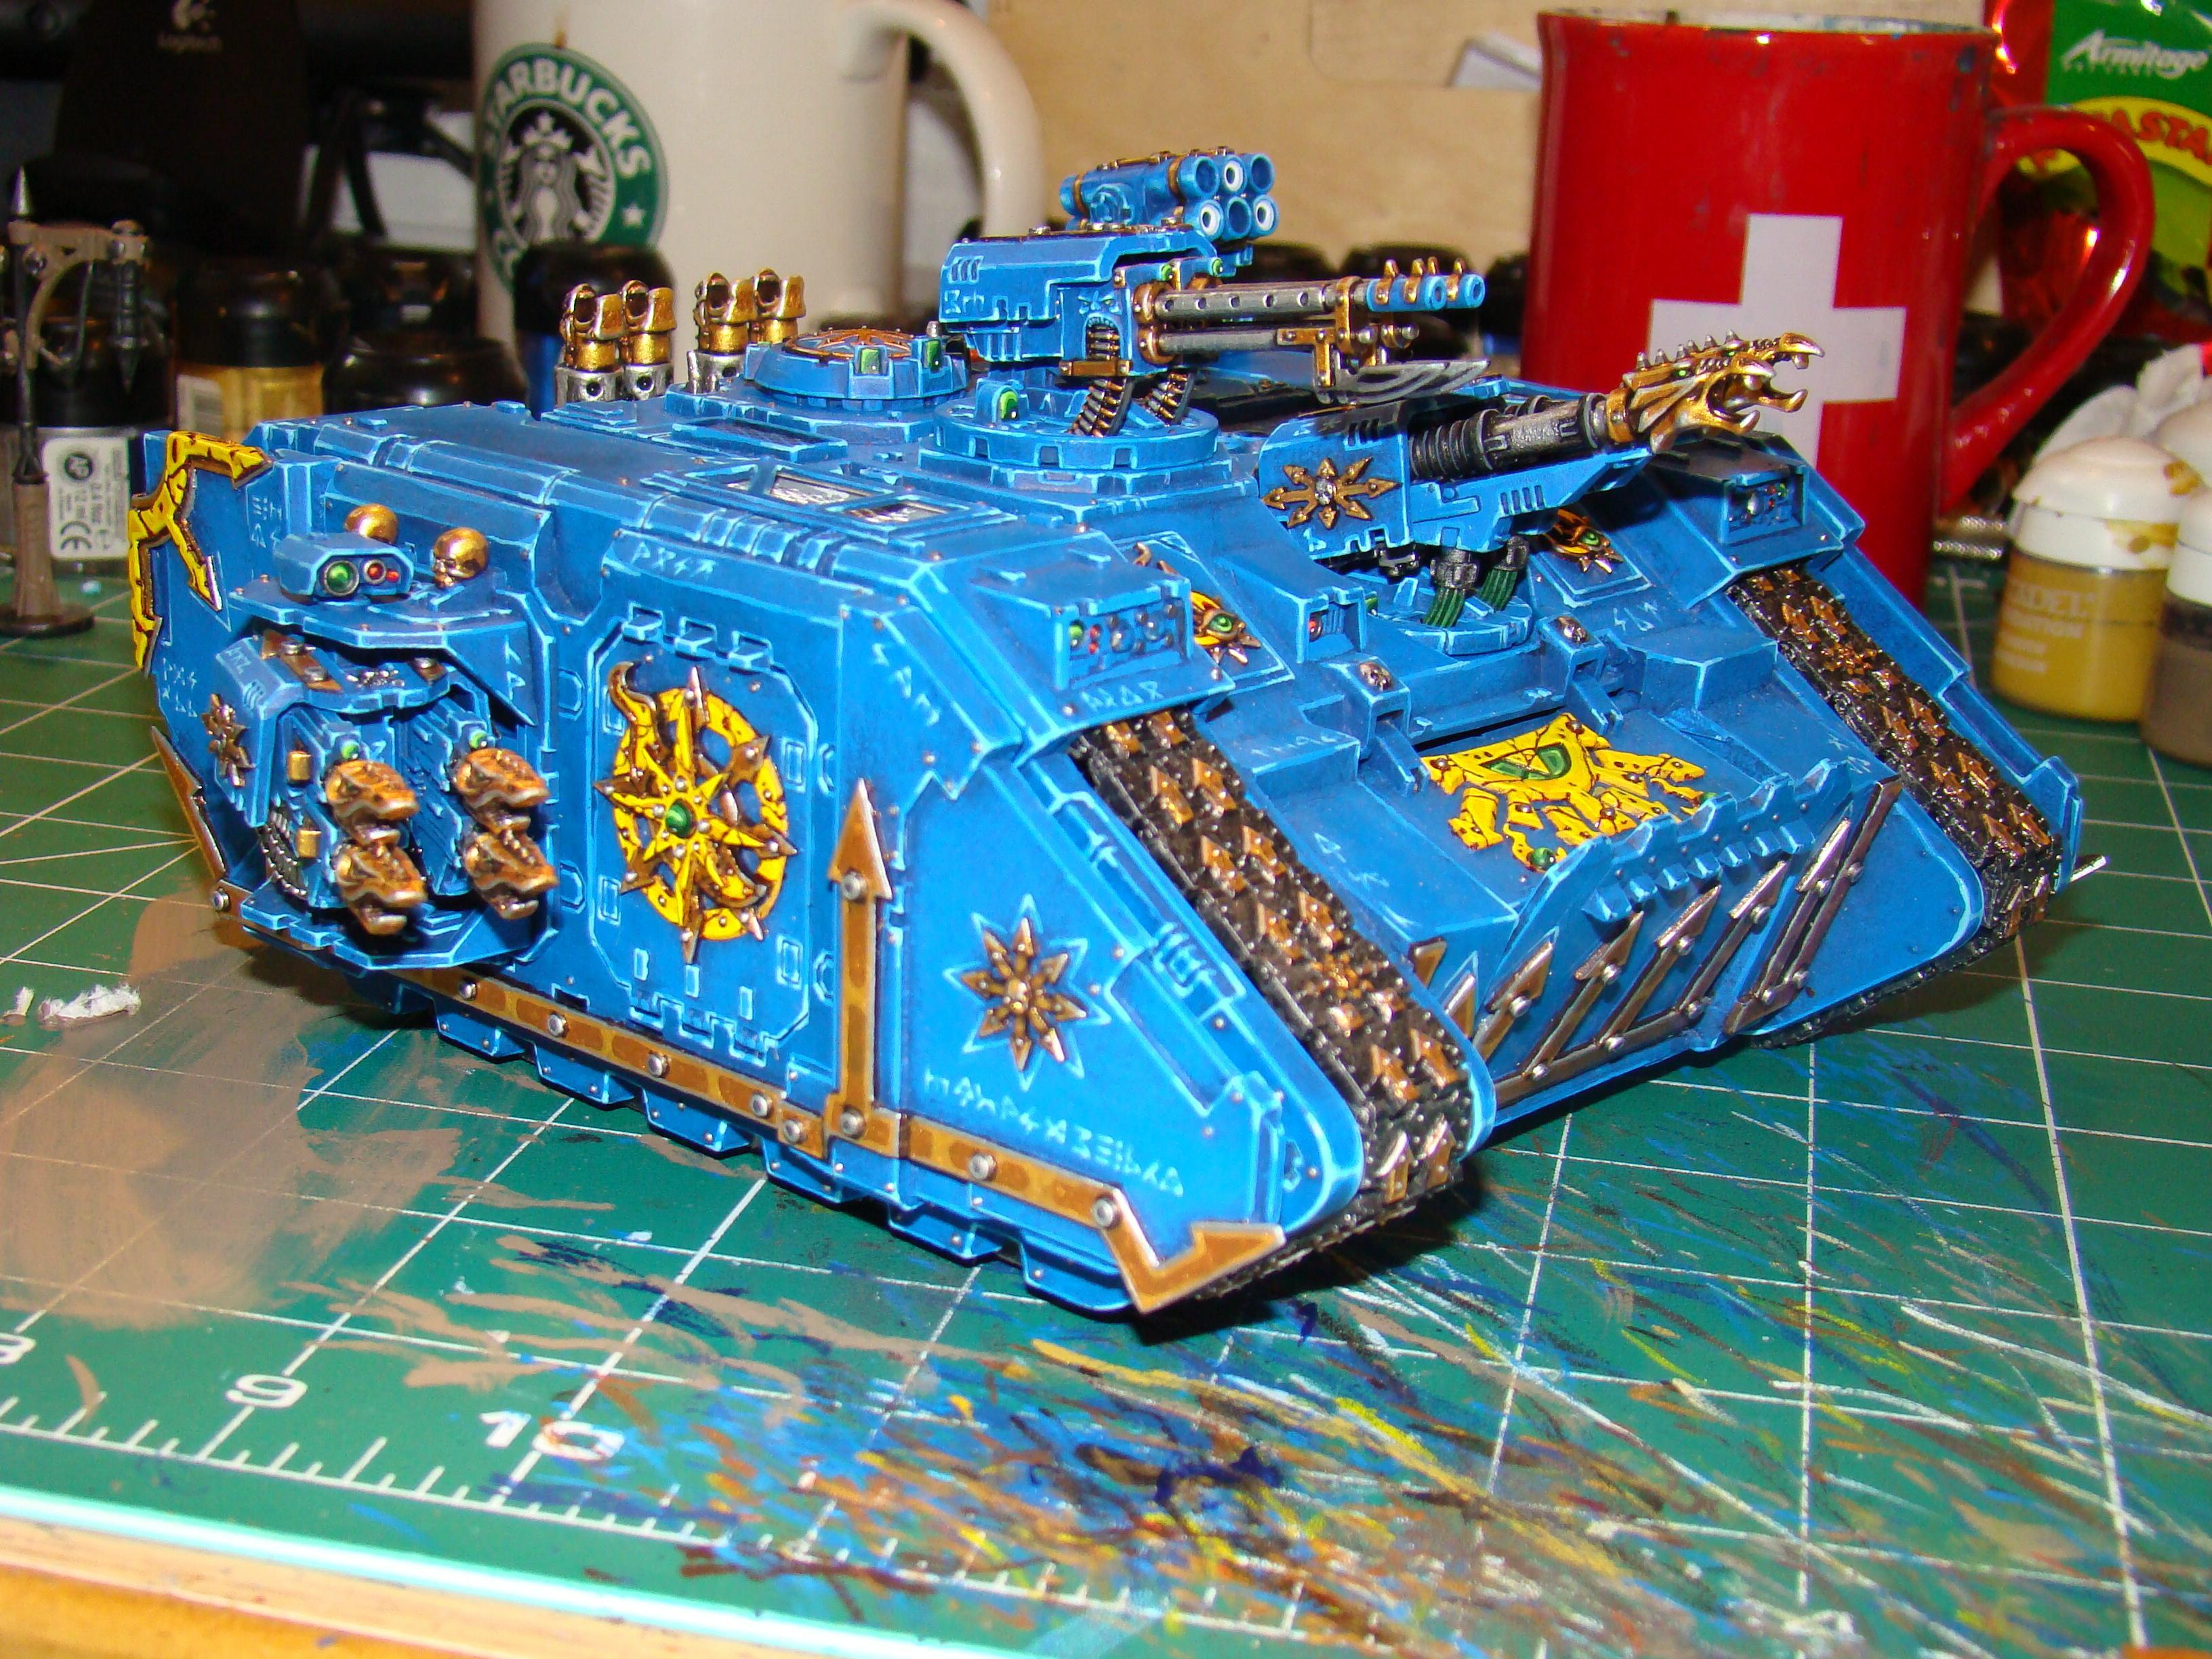 Chaos, Chaos Space Marines, Land Raider, Tank, Thousand Sons, Tzeentch, Vehicle, Warhammer 40,000